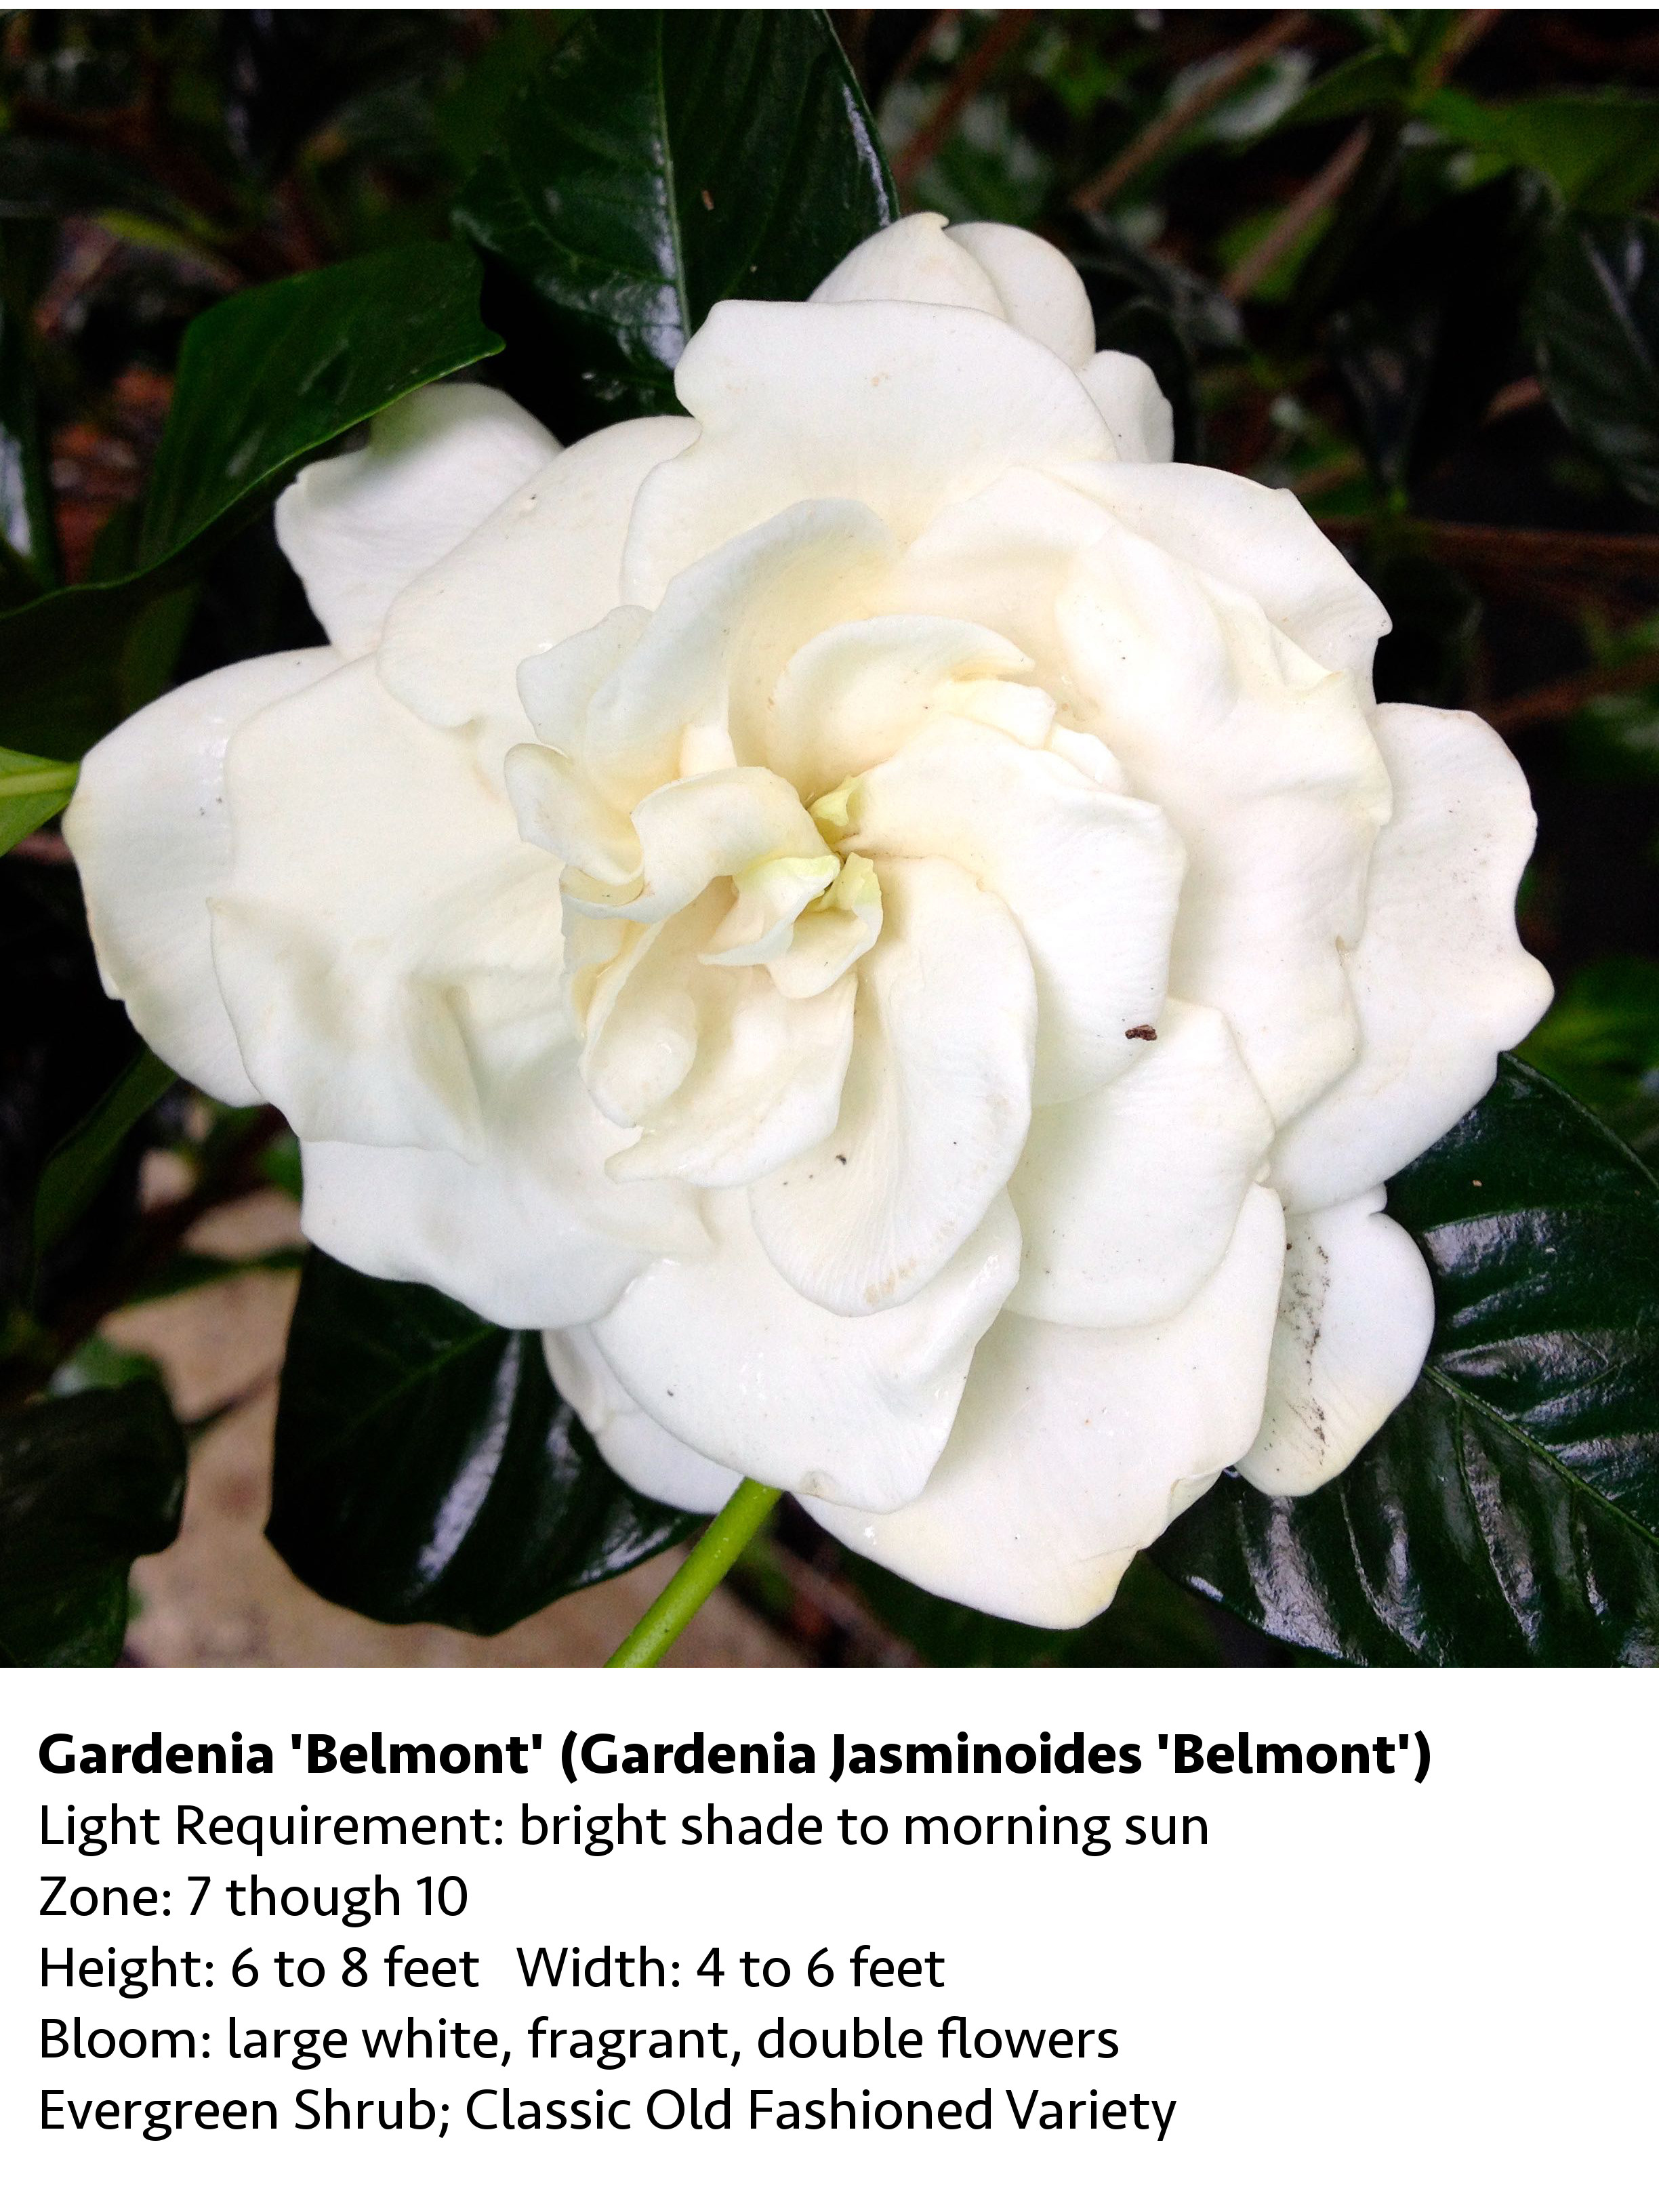 Charming Gardenia Garden Gate Nursery Gainesville Fl August Beauty Gardenia Not Blooming August Beauty Gardenia Pruning houzz-03 August Beauty Gardenia